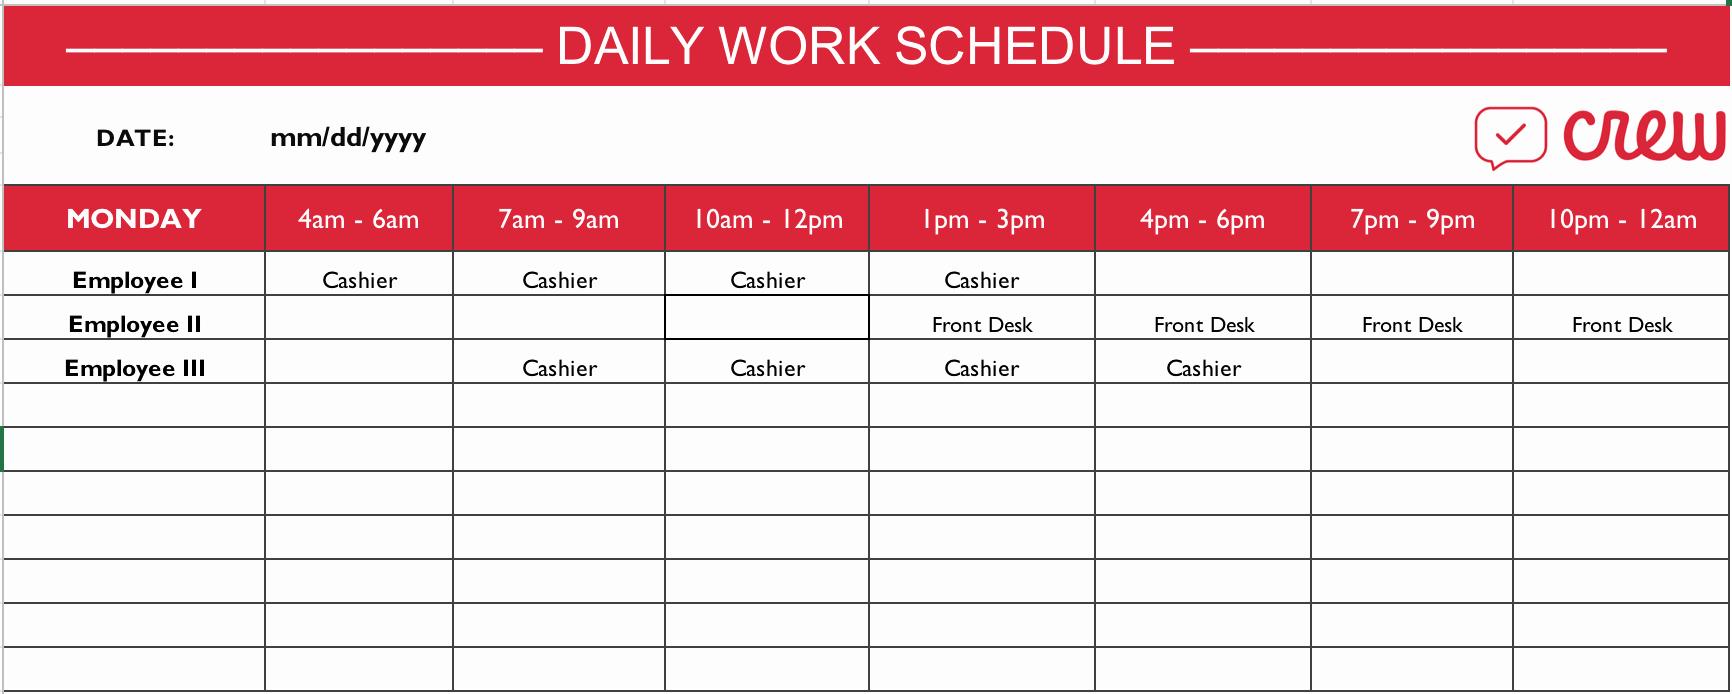 Weekly Work Schedule Template Free Inspirational Free Daily Work Schedule Template Crew